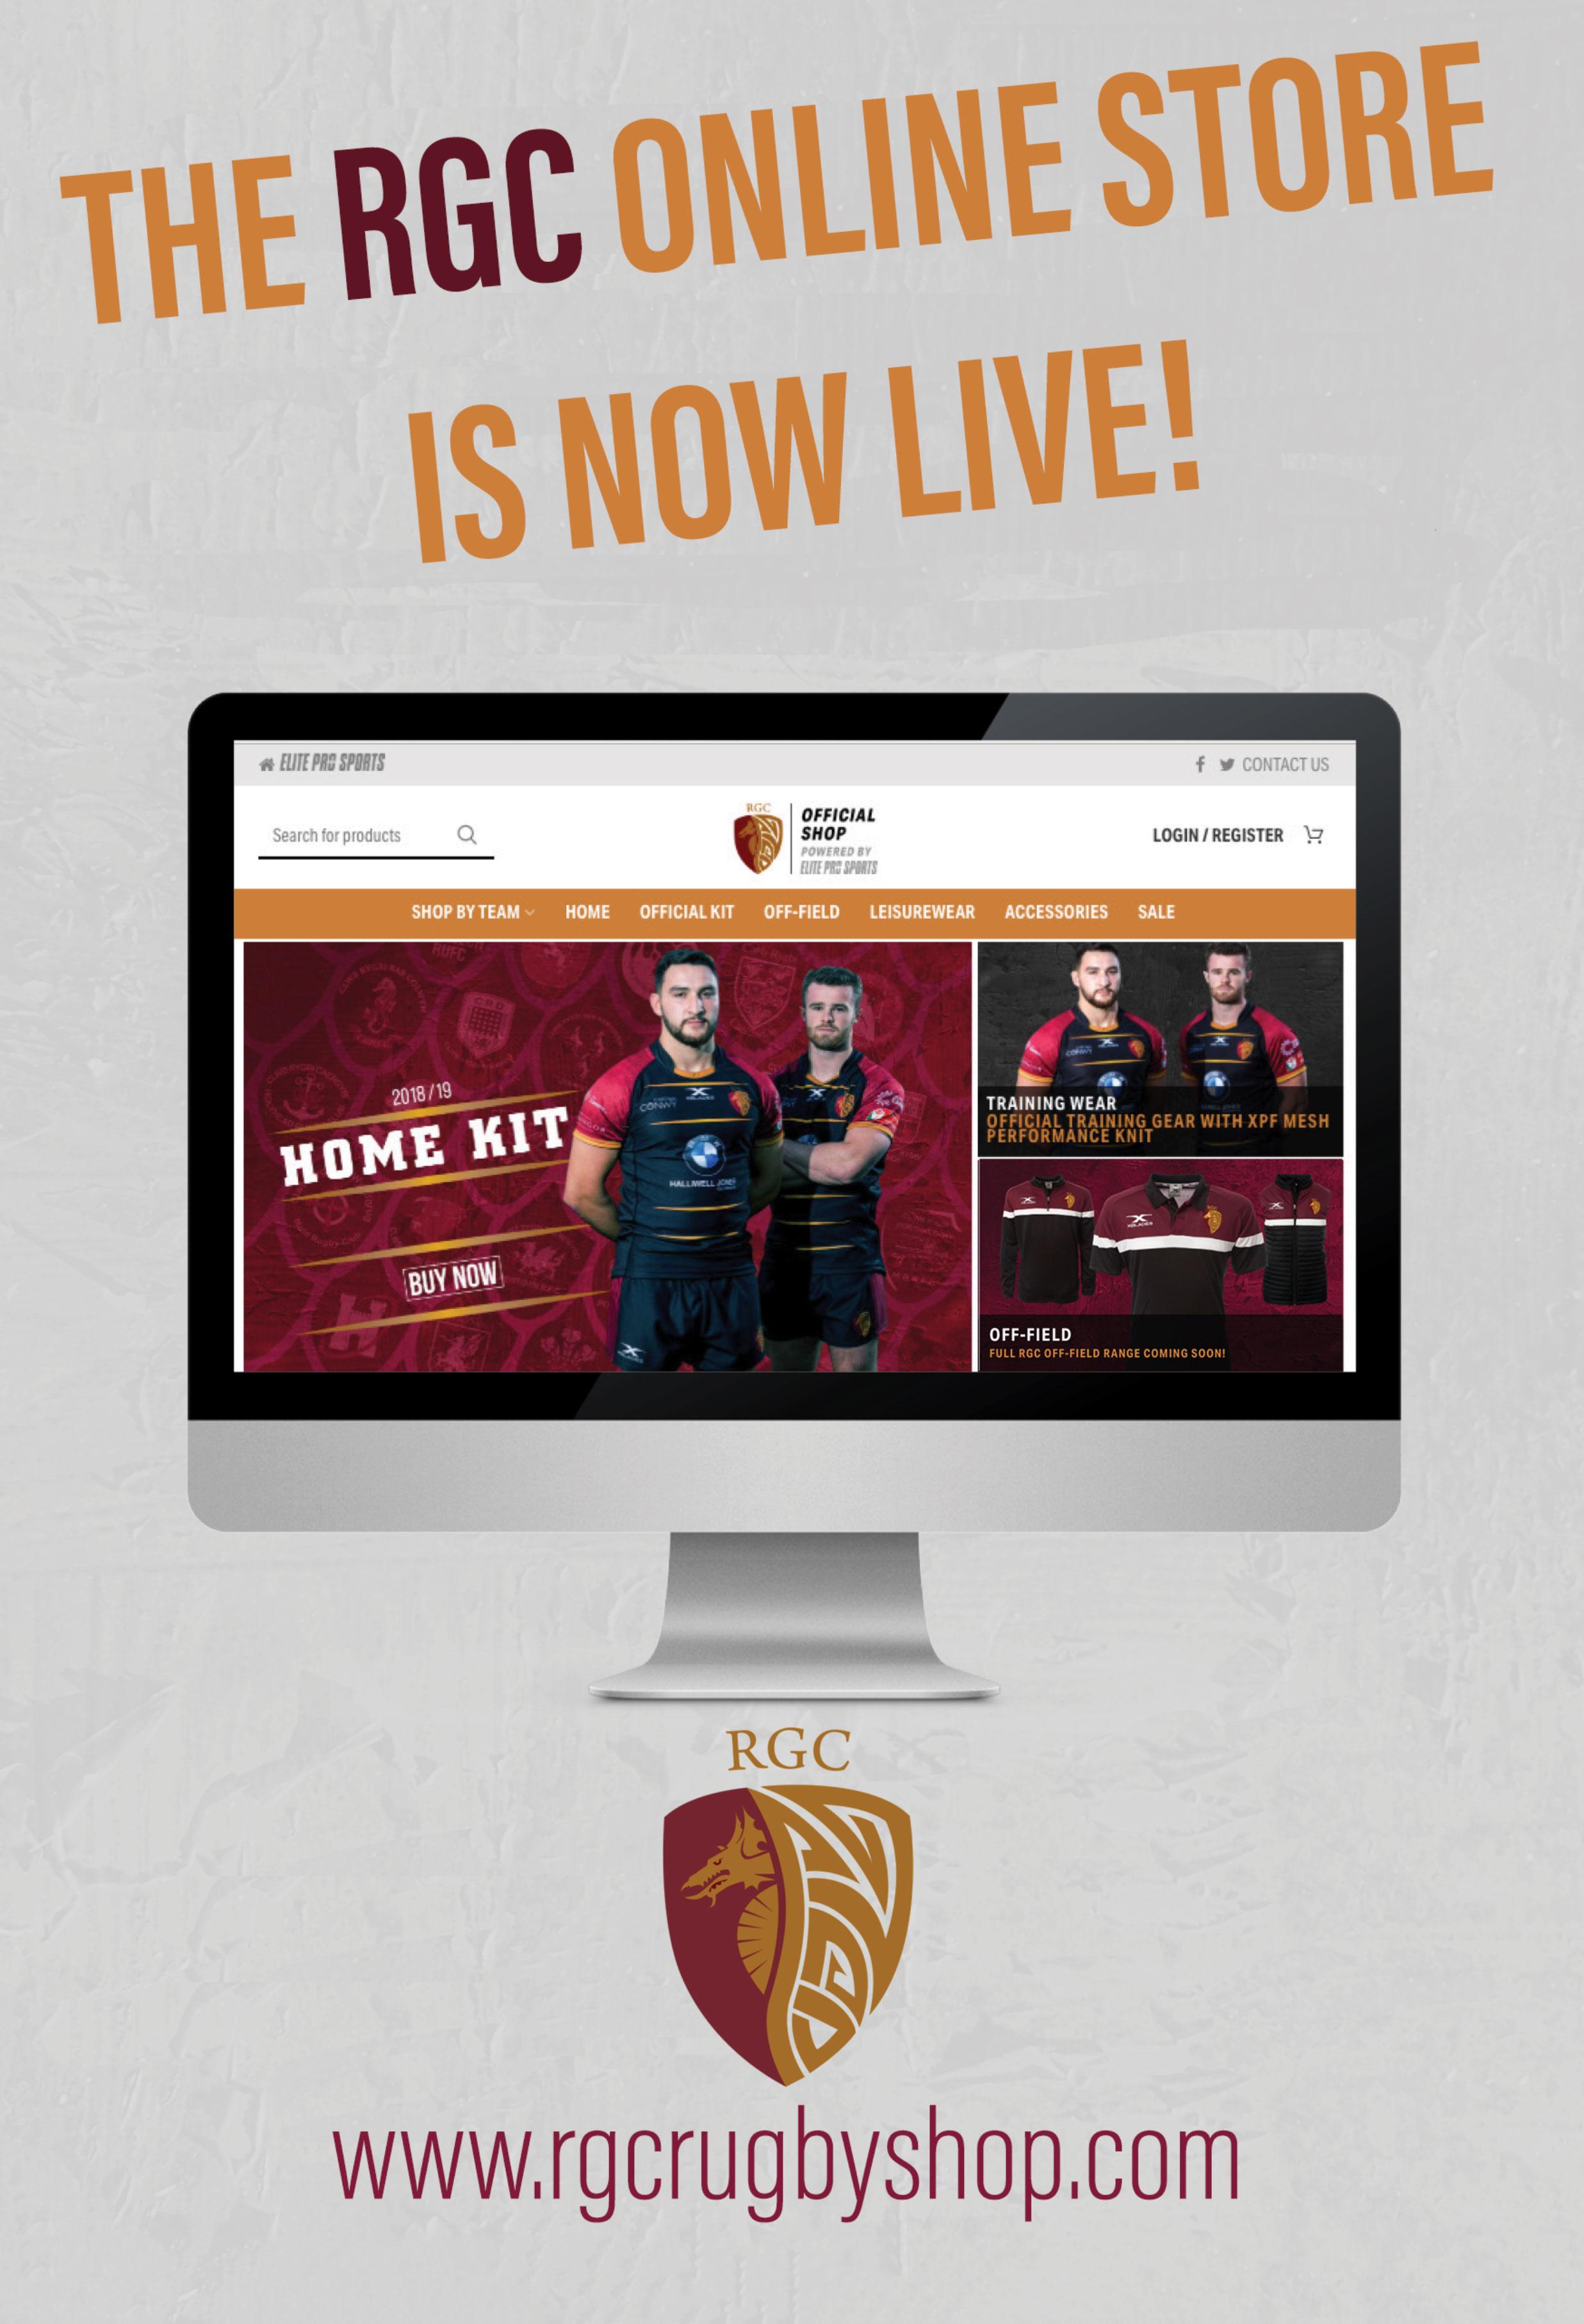 RGC Online Store